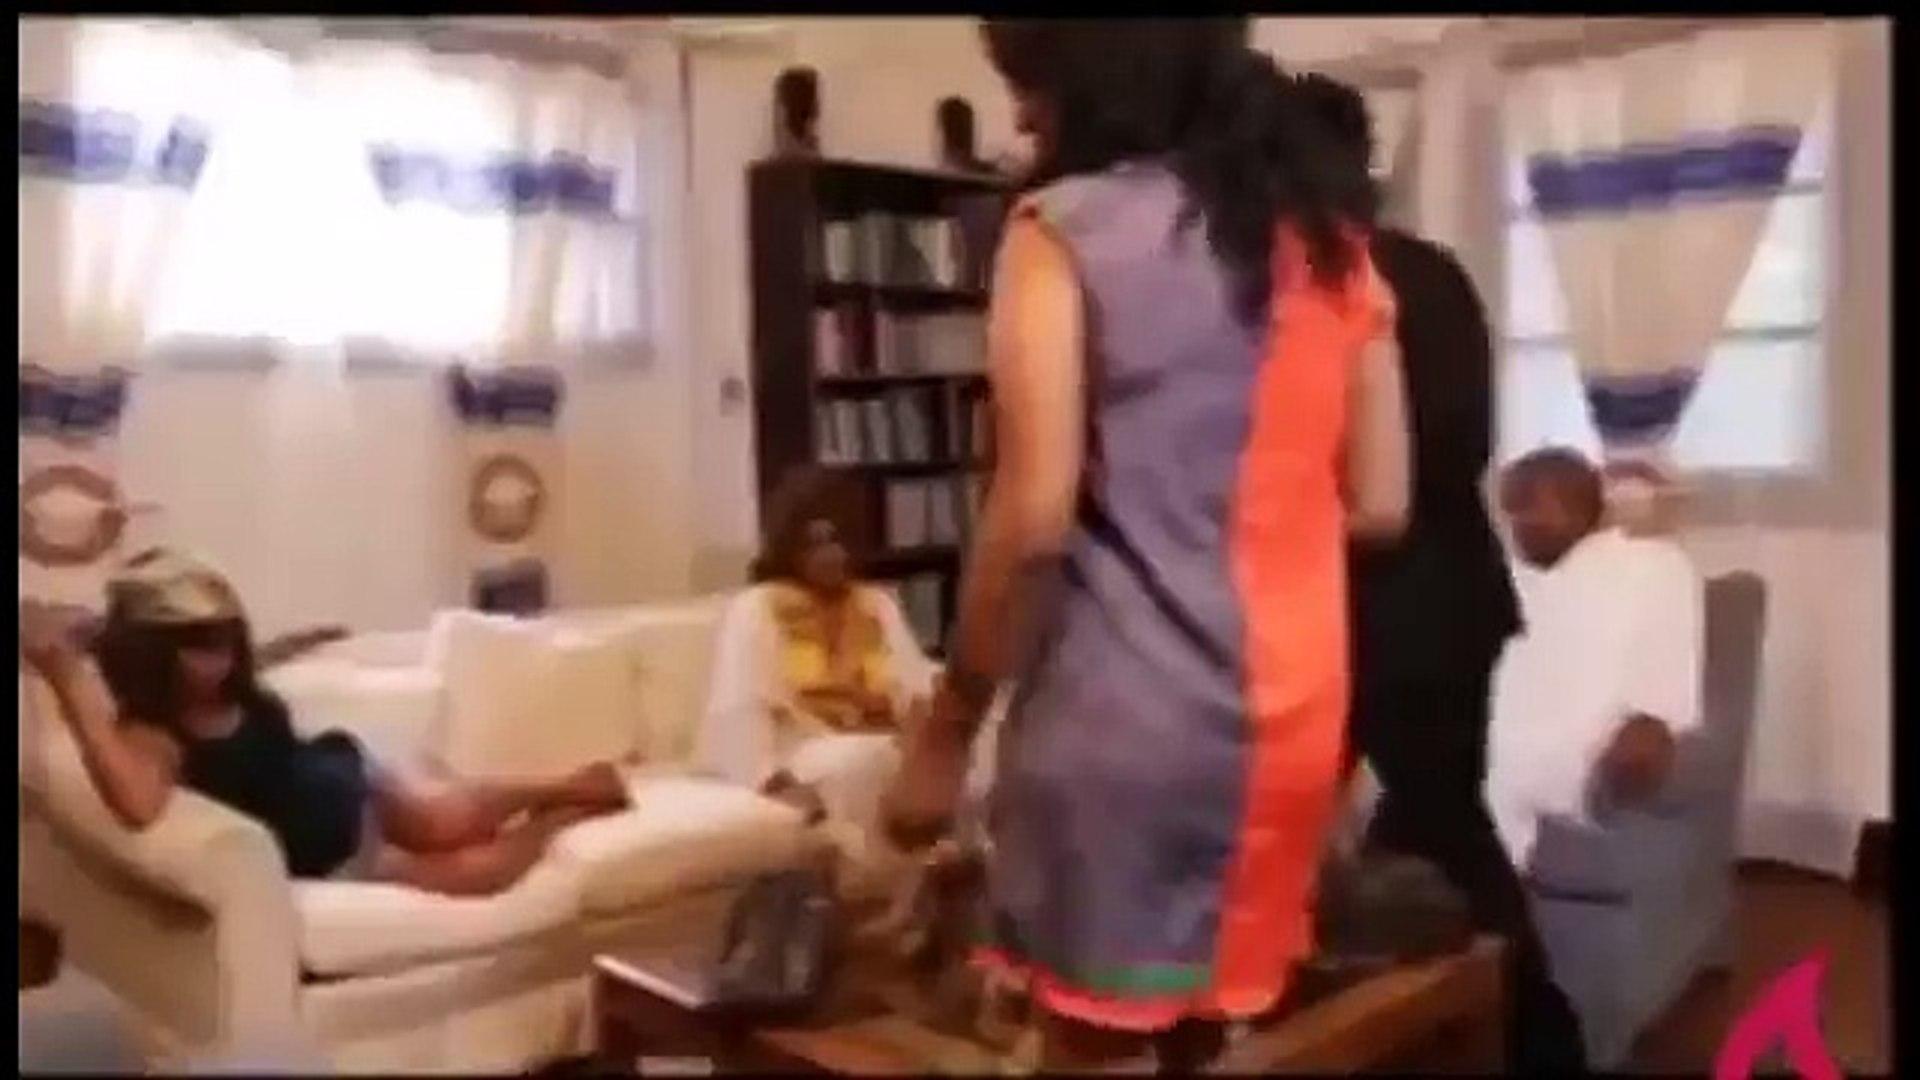 yileyayachewi ihitochi - 2017 ETHIOPIAN MOVIES - FULL ETHIOPIAN MOVIES 2017 , Cinema Movies Tv FullH